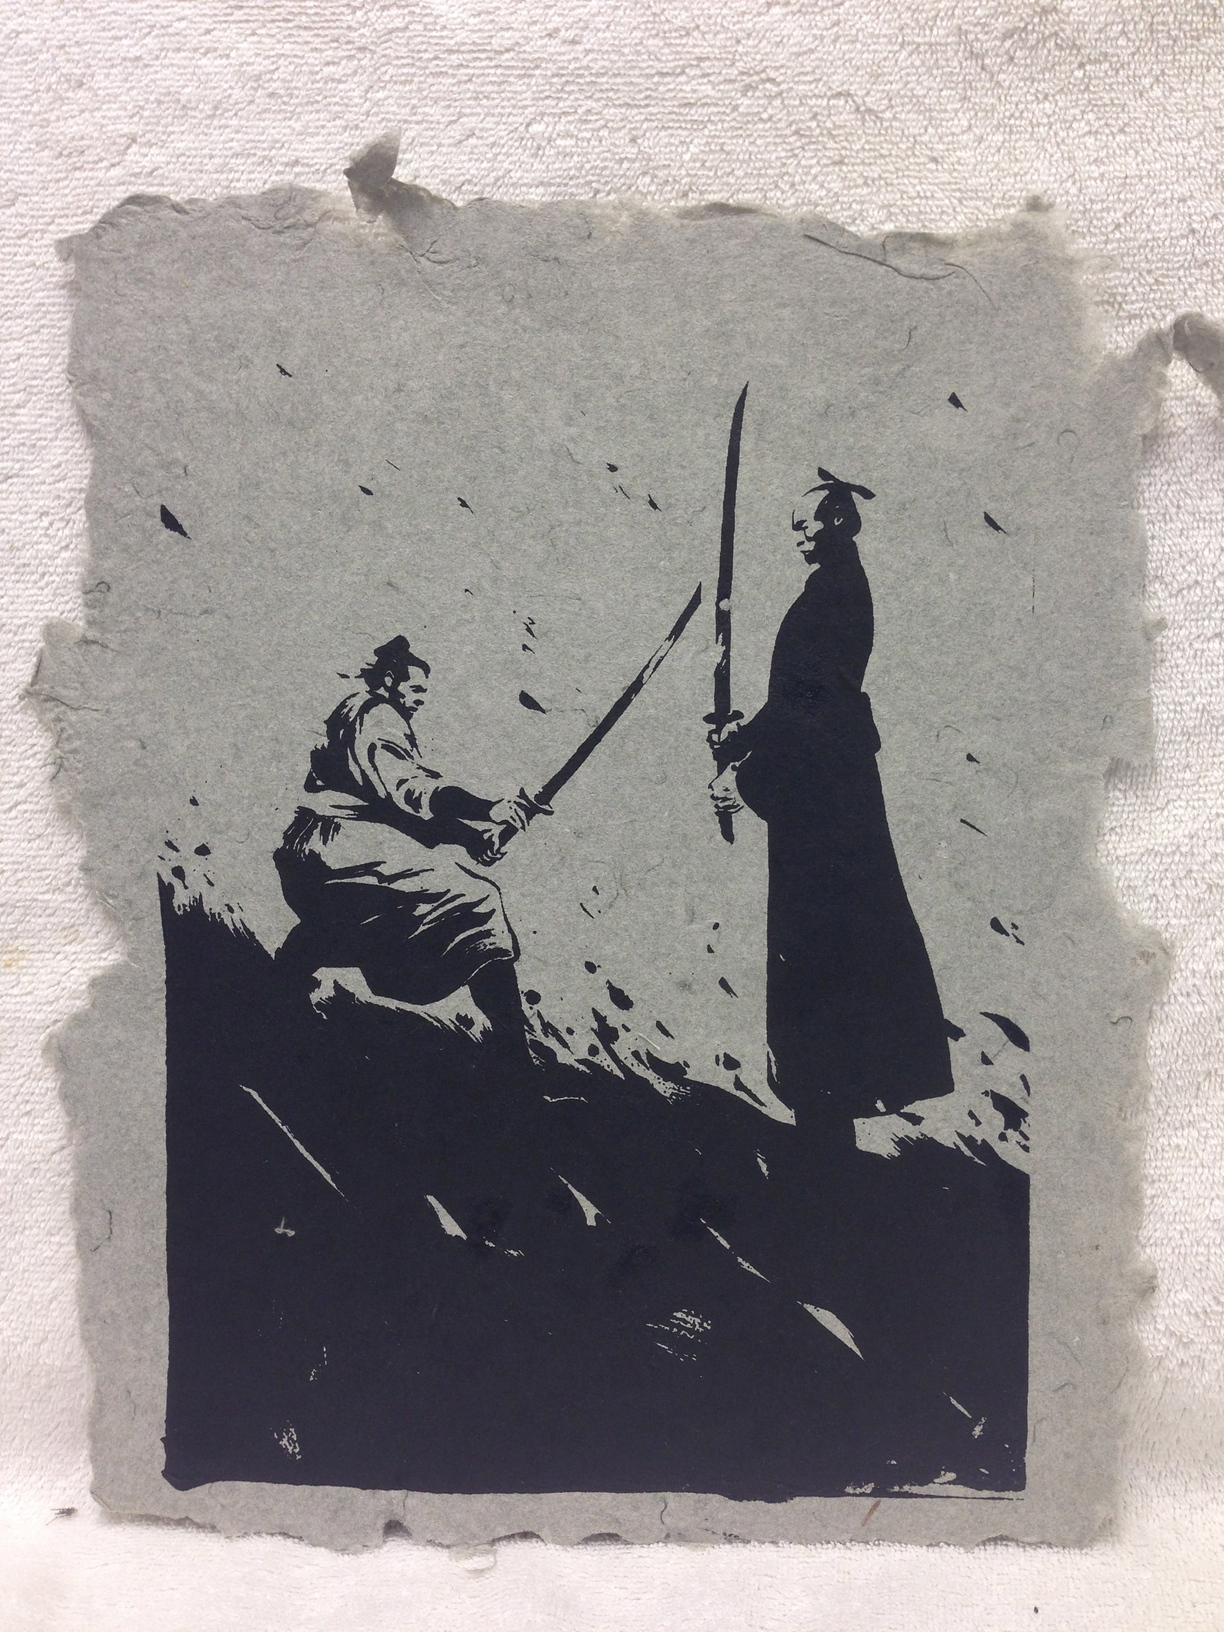 Anonymous _Samurai_ 2013 Silkscreen on handmade paper made from military uniforms Ft Belvoir Workshop IMG_0947 - Copy.jpg